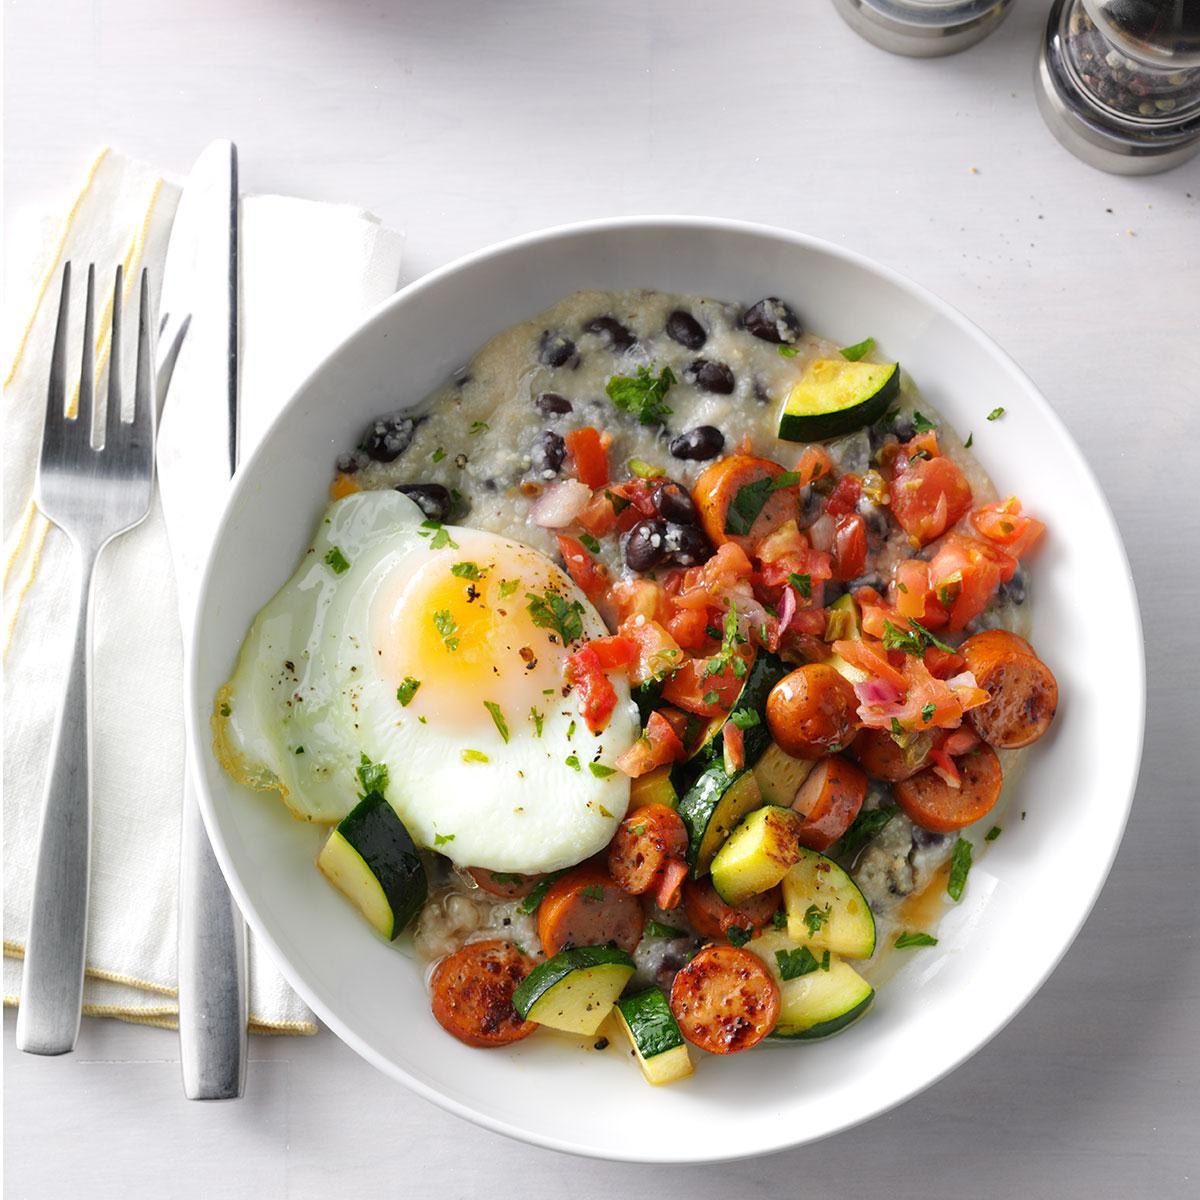 Healthy Hot Breakfast  Chorizo & Grits Breakfast Bowls Recipe